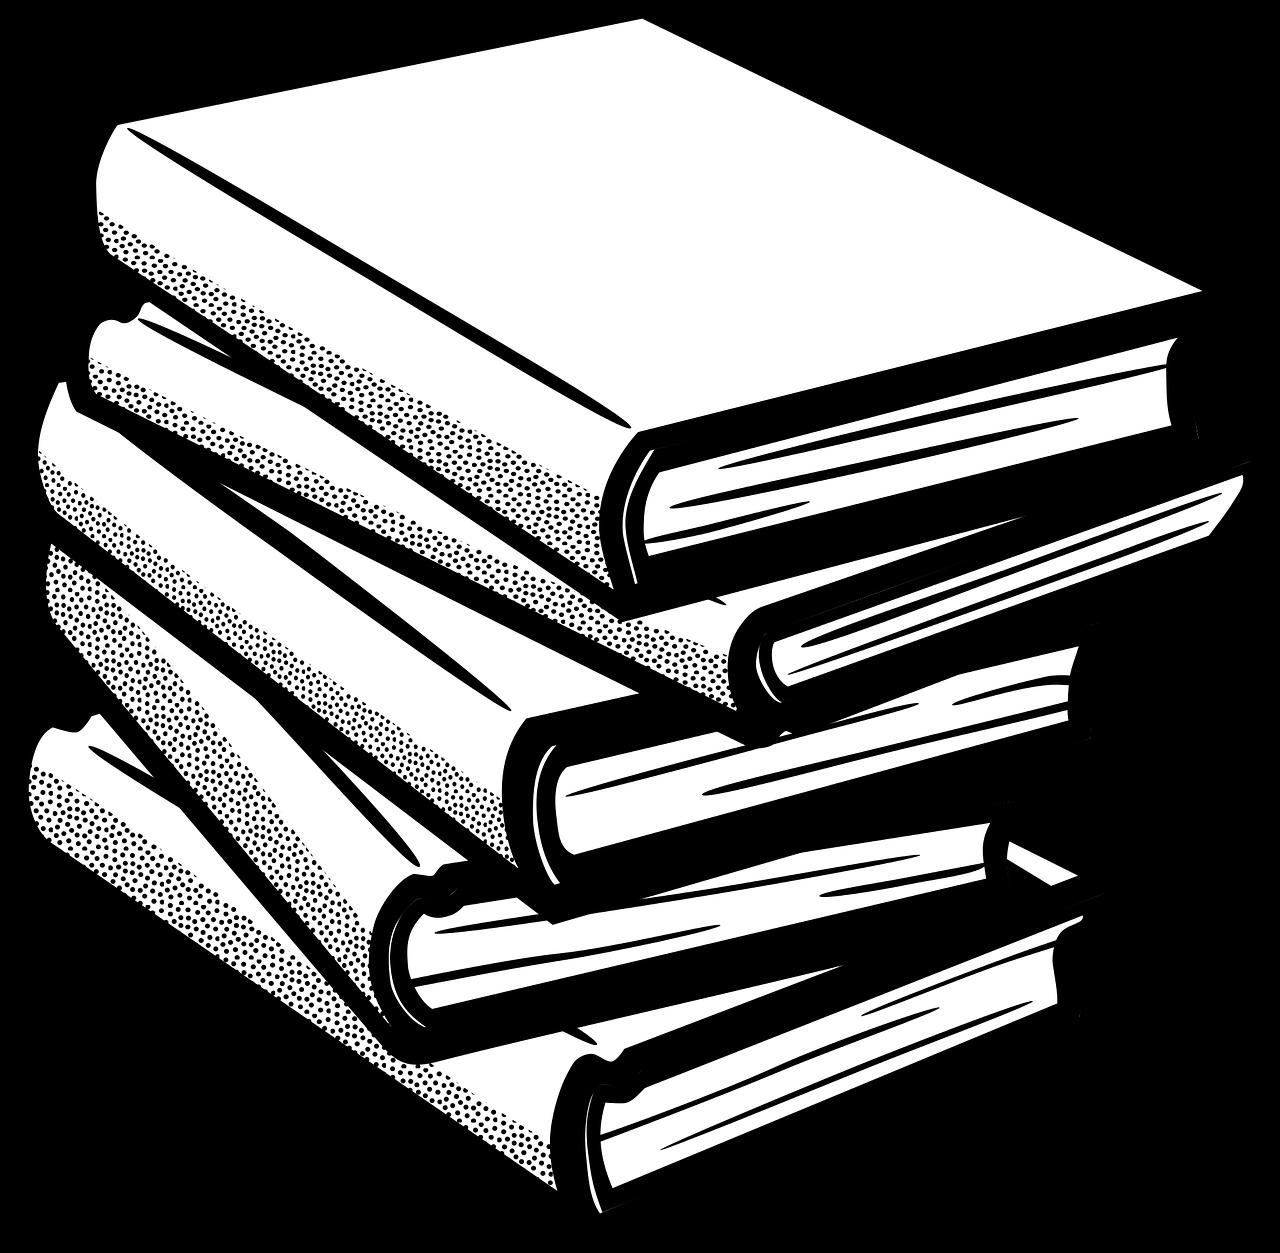 komín knih